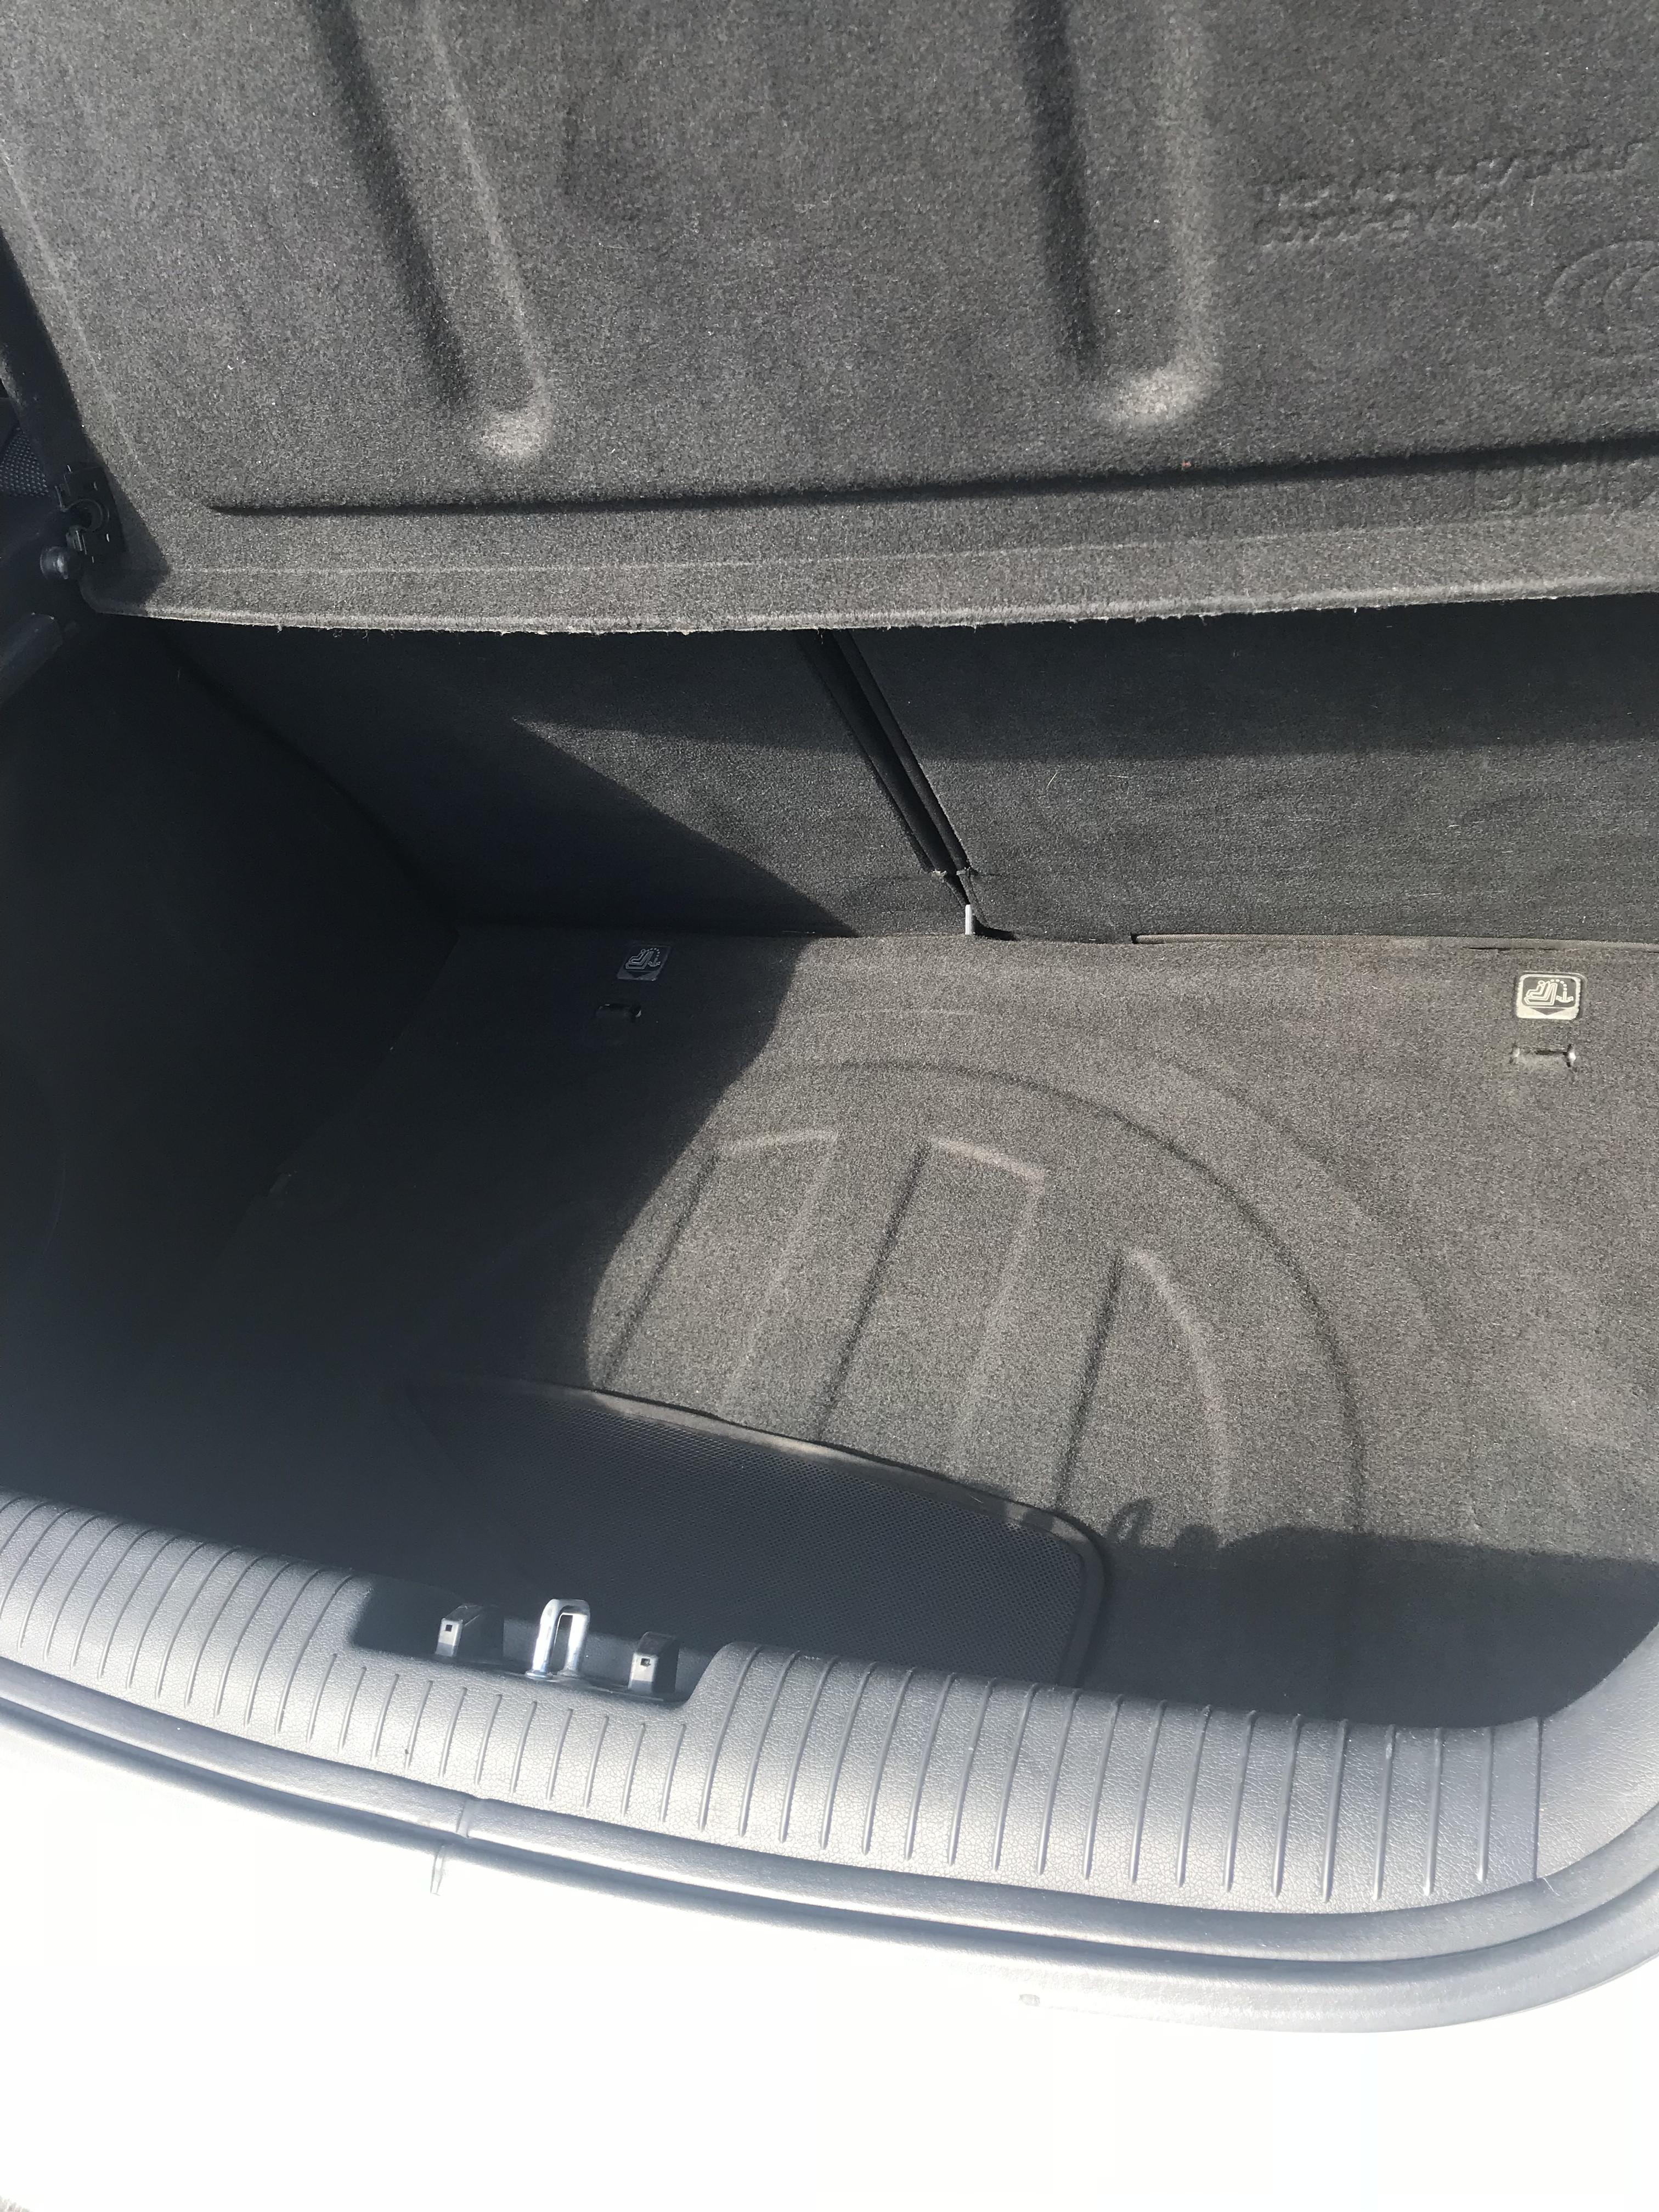 Hyundai Veloster 1.6(lt) 2012 İkinci əl  $10300